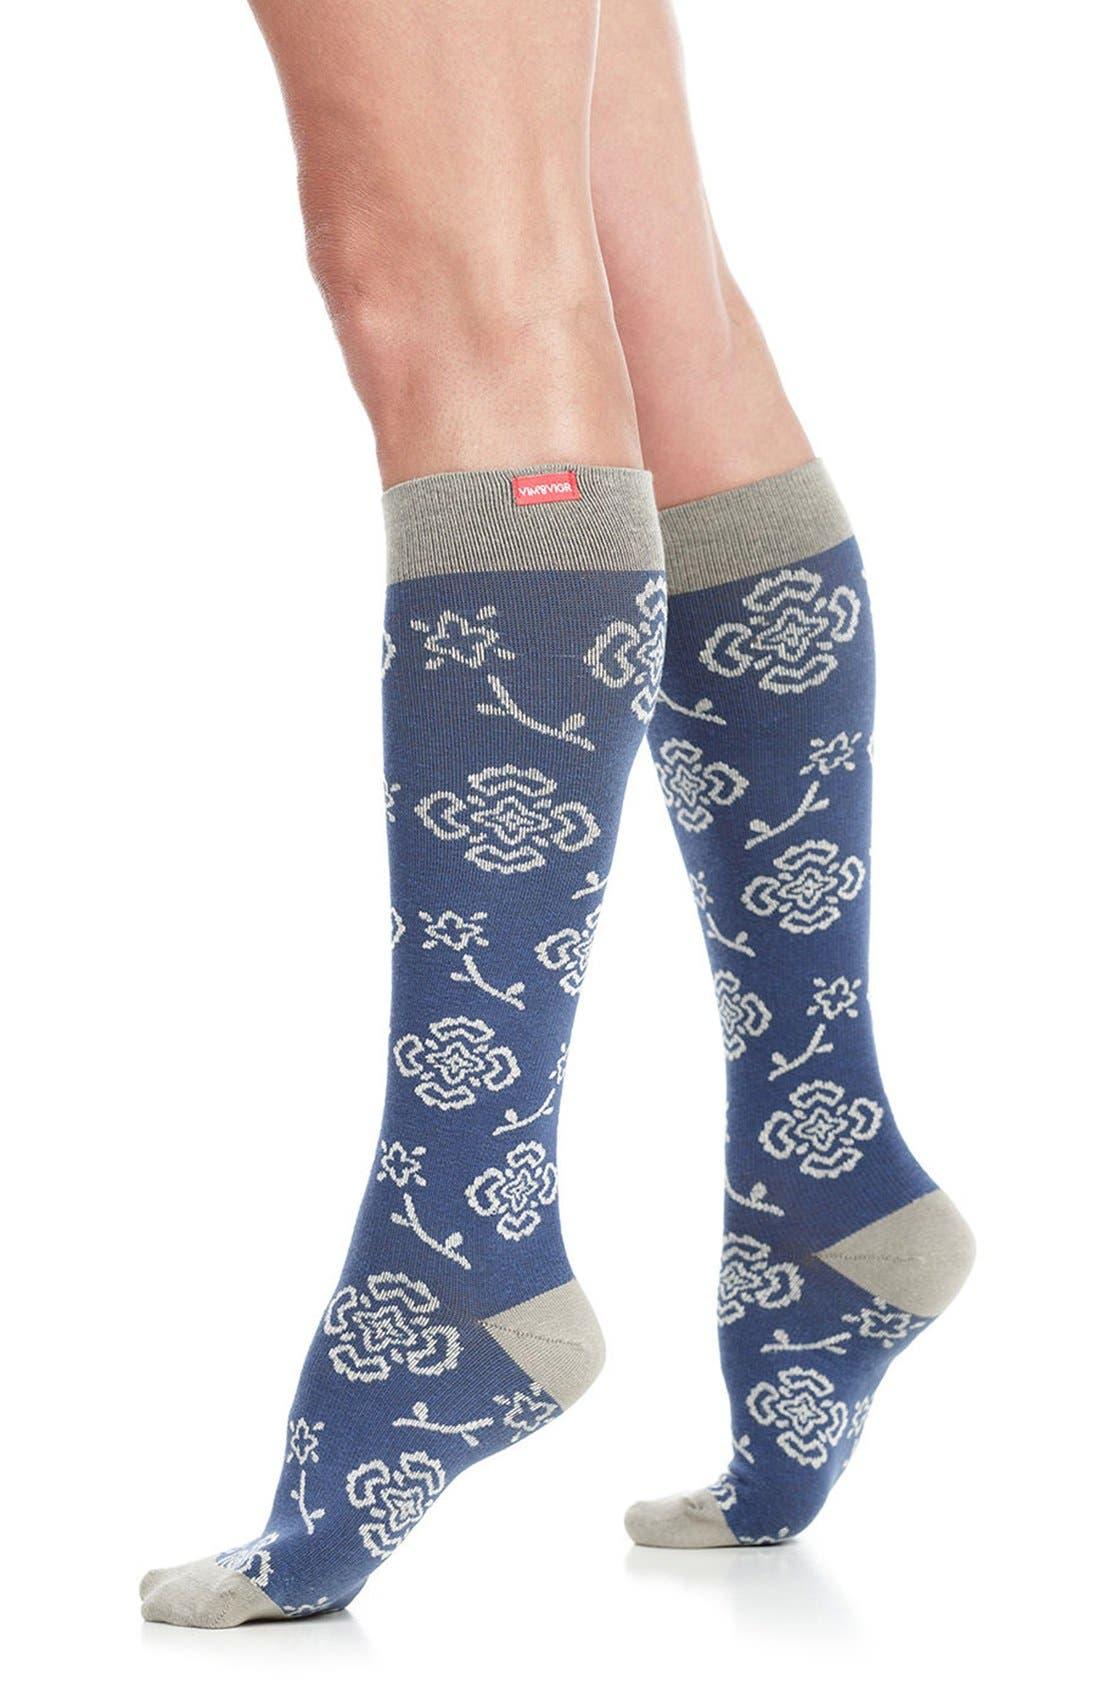 Queen's Floral Compression Trouser Socks,                             Main thumbnail 1, color,                             Blue/ Charcoal